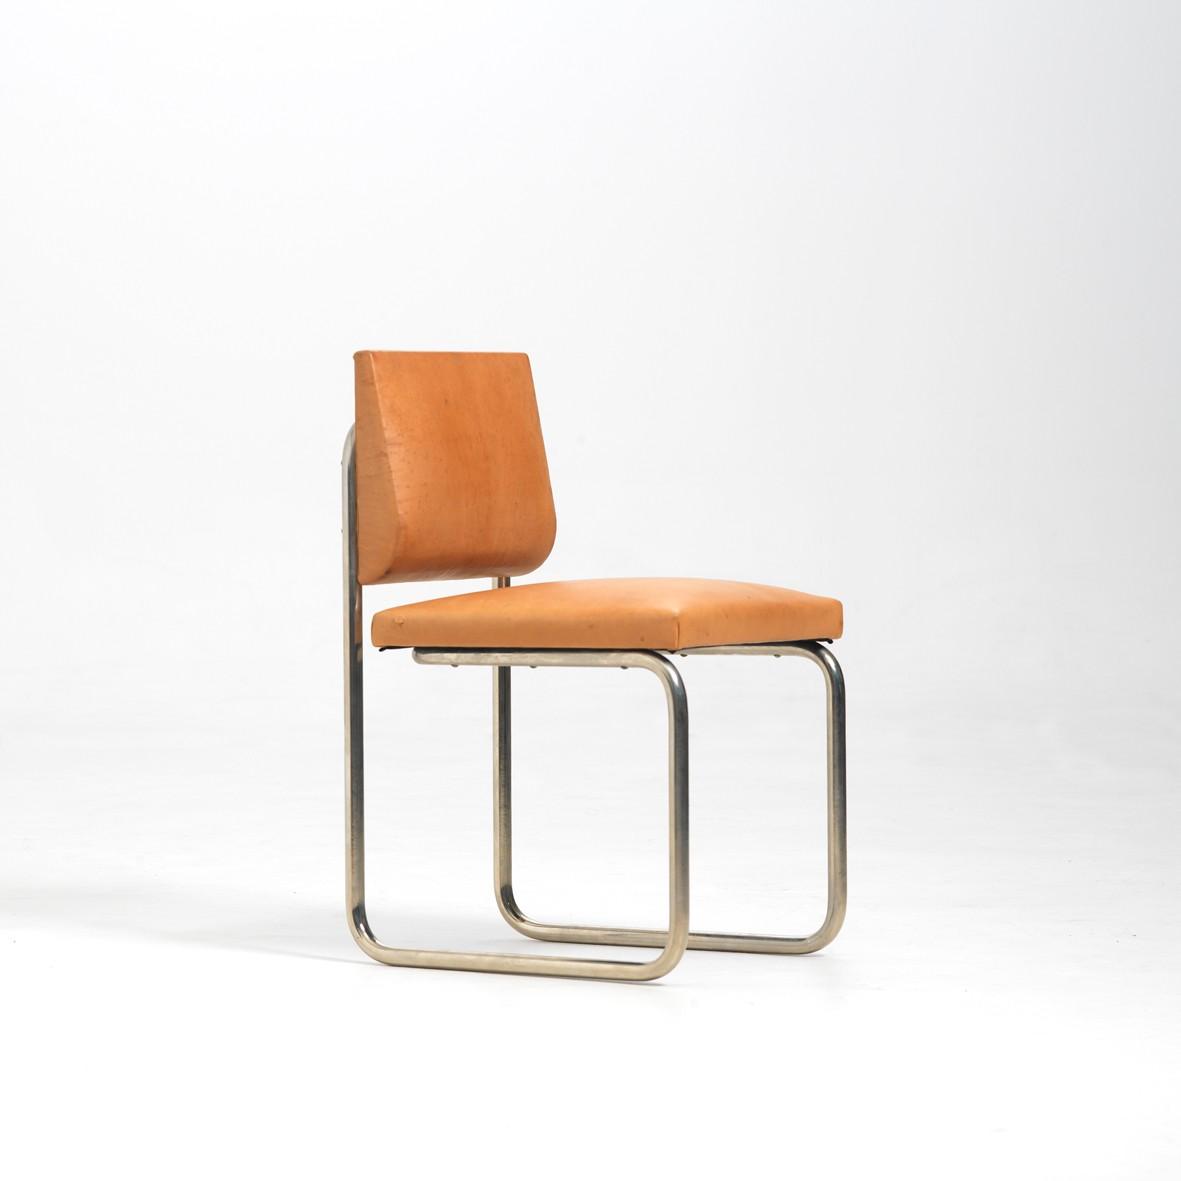 sornay-tubular-metal-chair.jpg